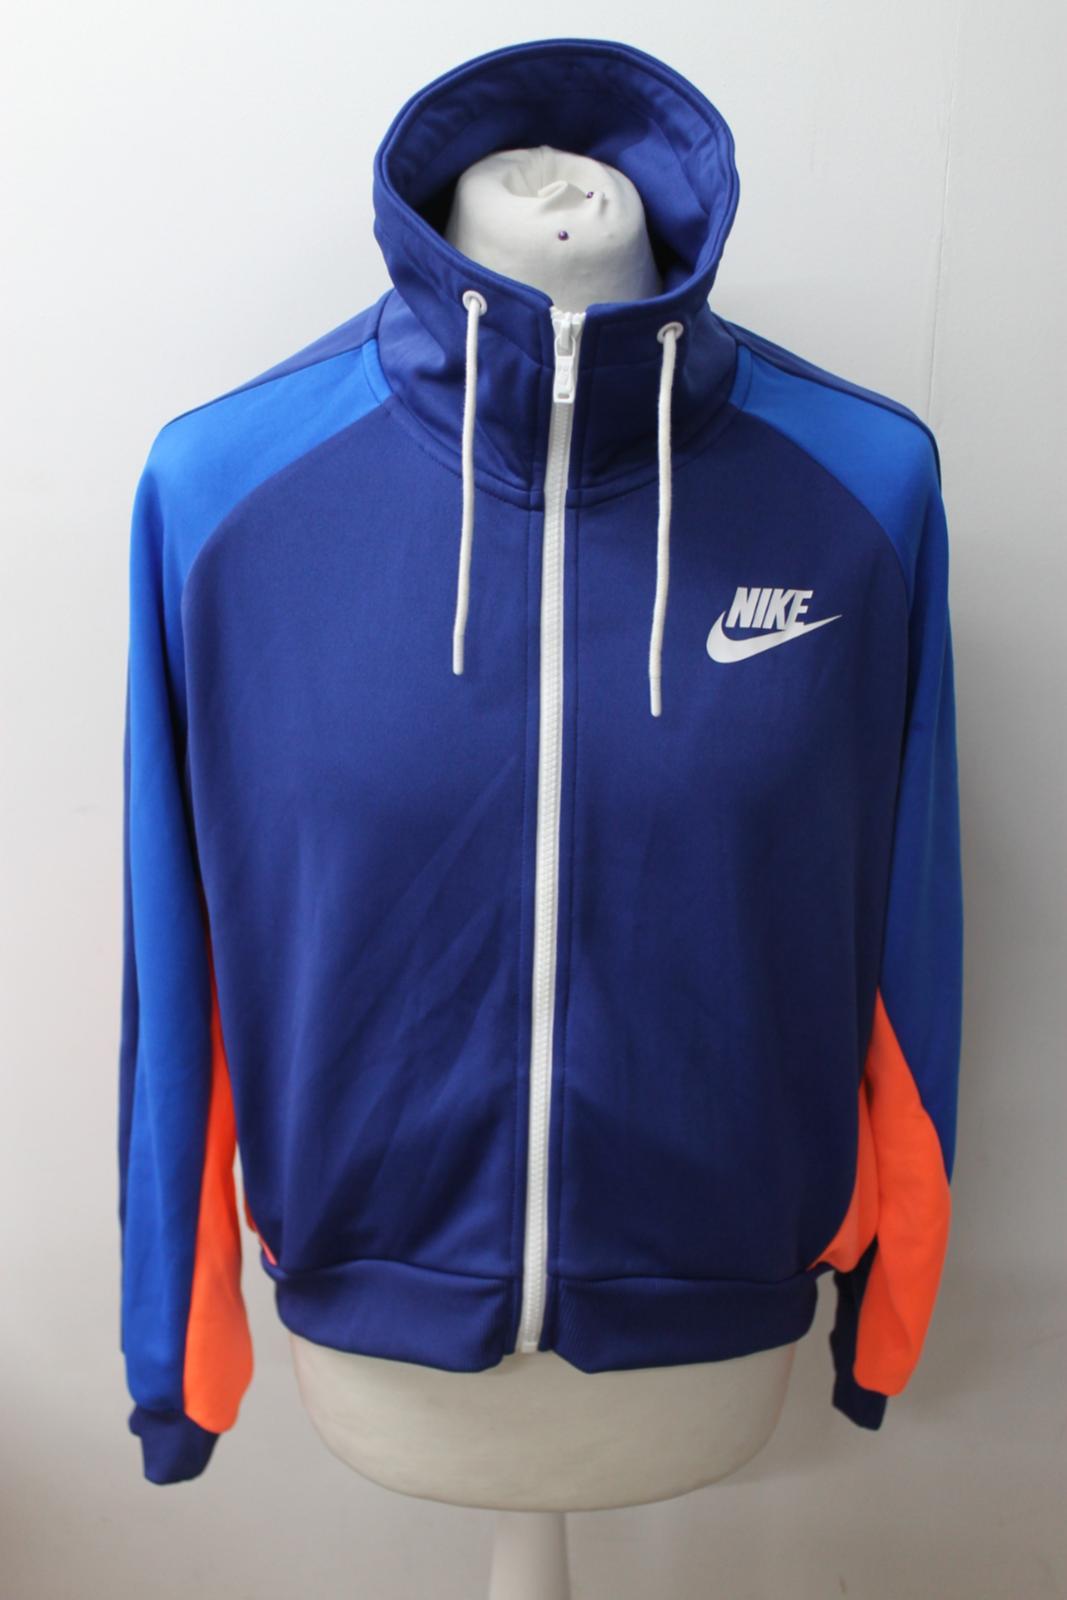 7cf7b2f5c NIKE Ladies Blue & Orange Loose Fit Long Sleeve Zip Up Jacket Size L ...